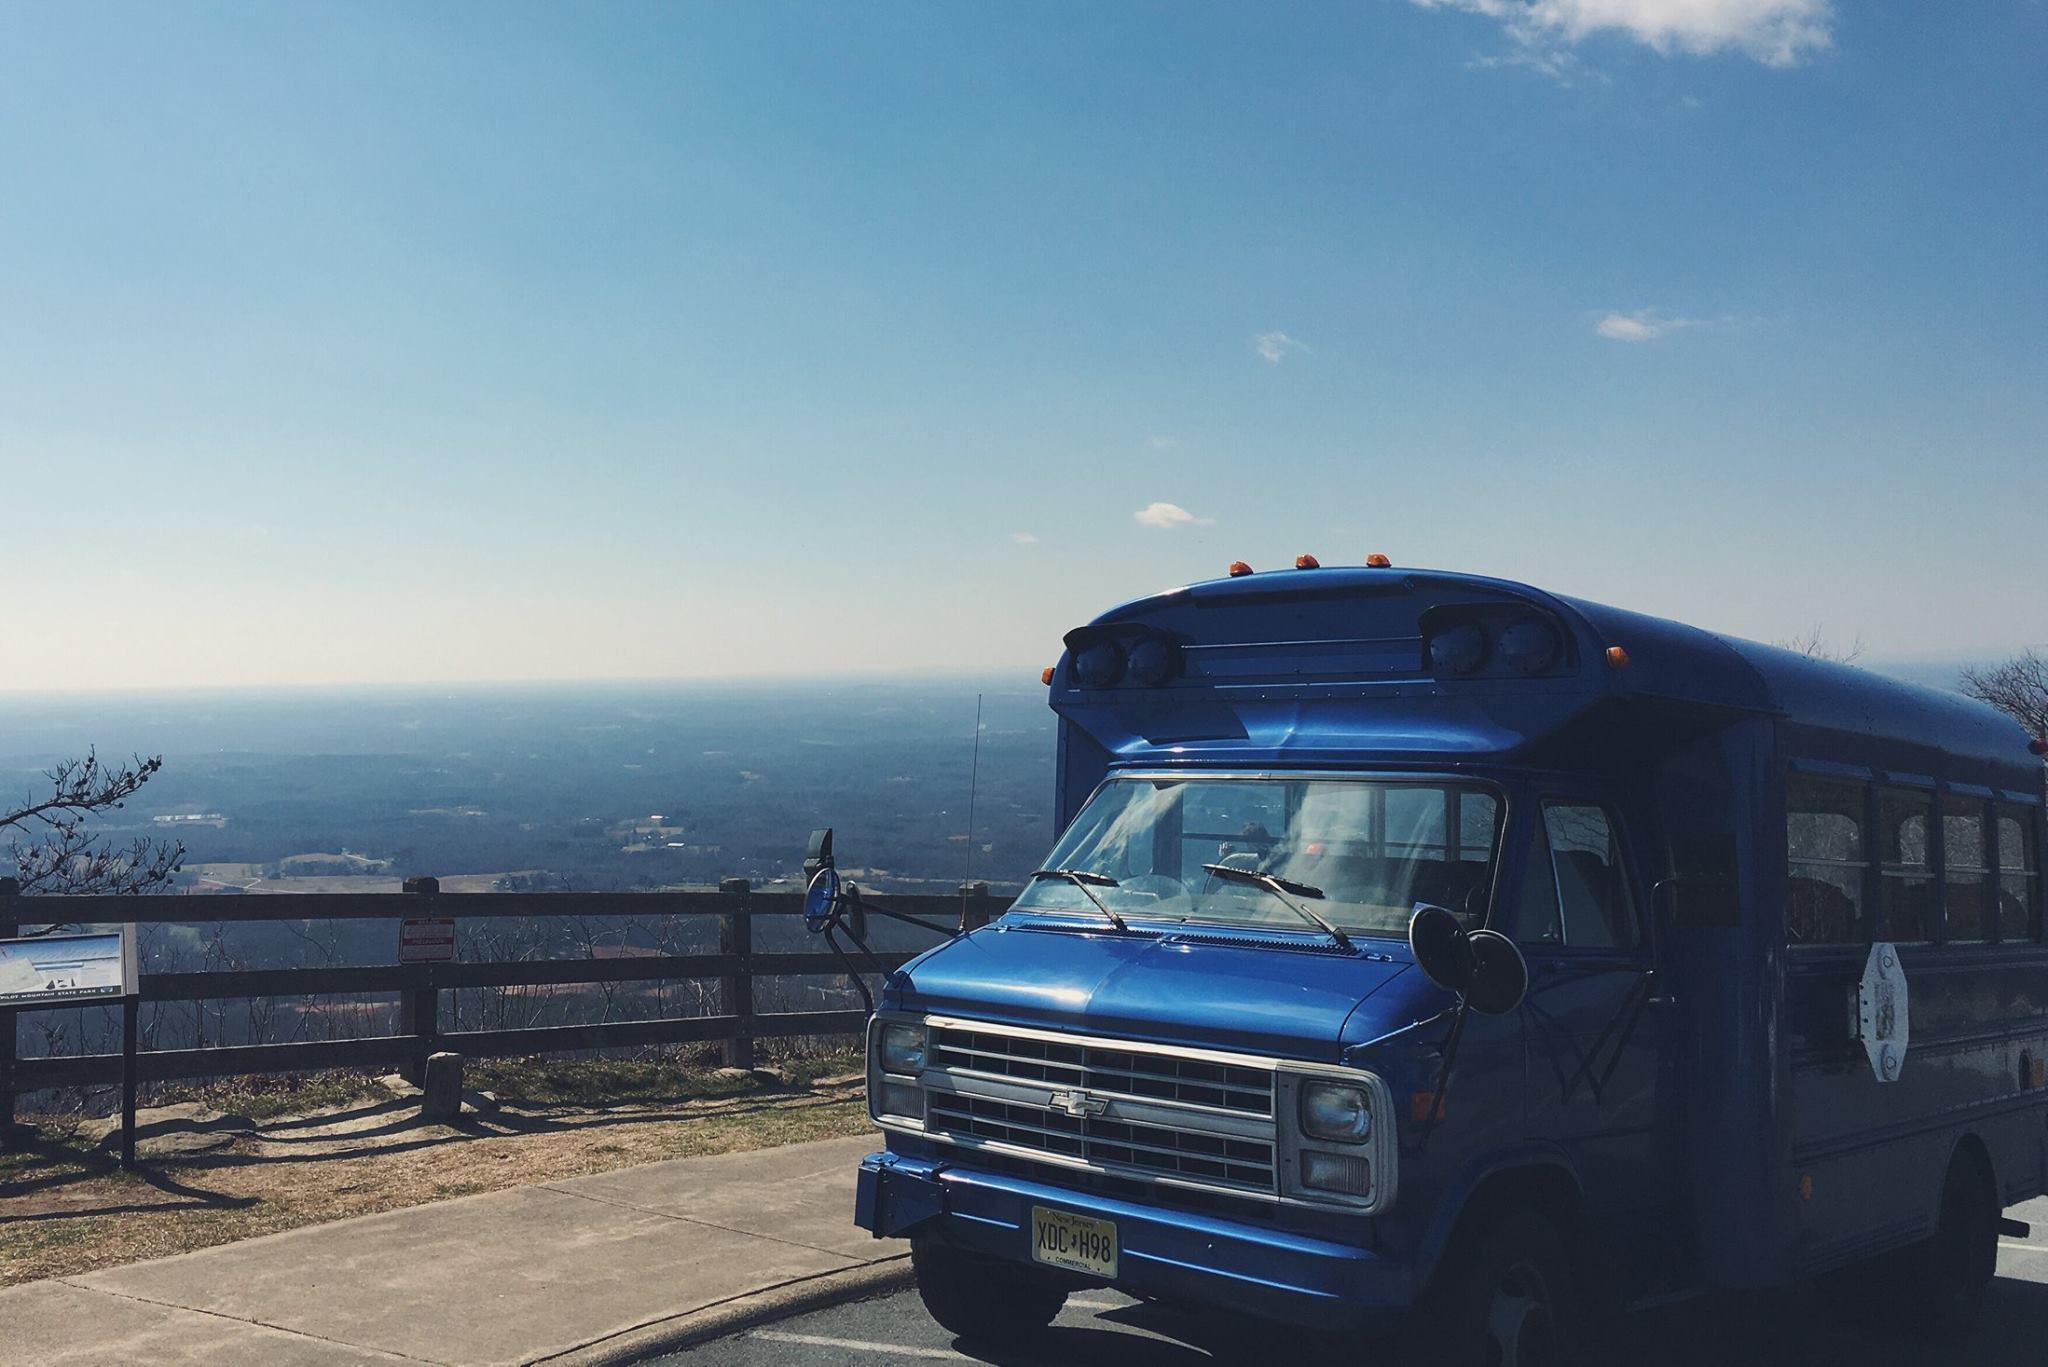 2.27.16 - Sure enough we made it! - Pilot Mountain, North Carolina